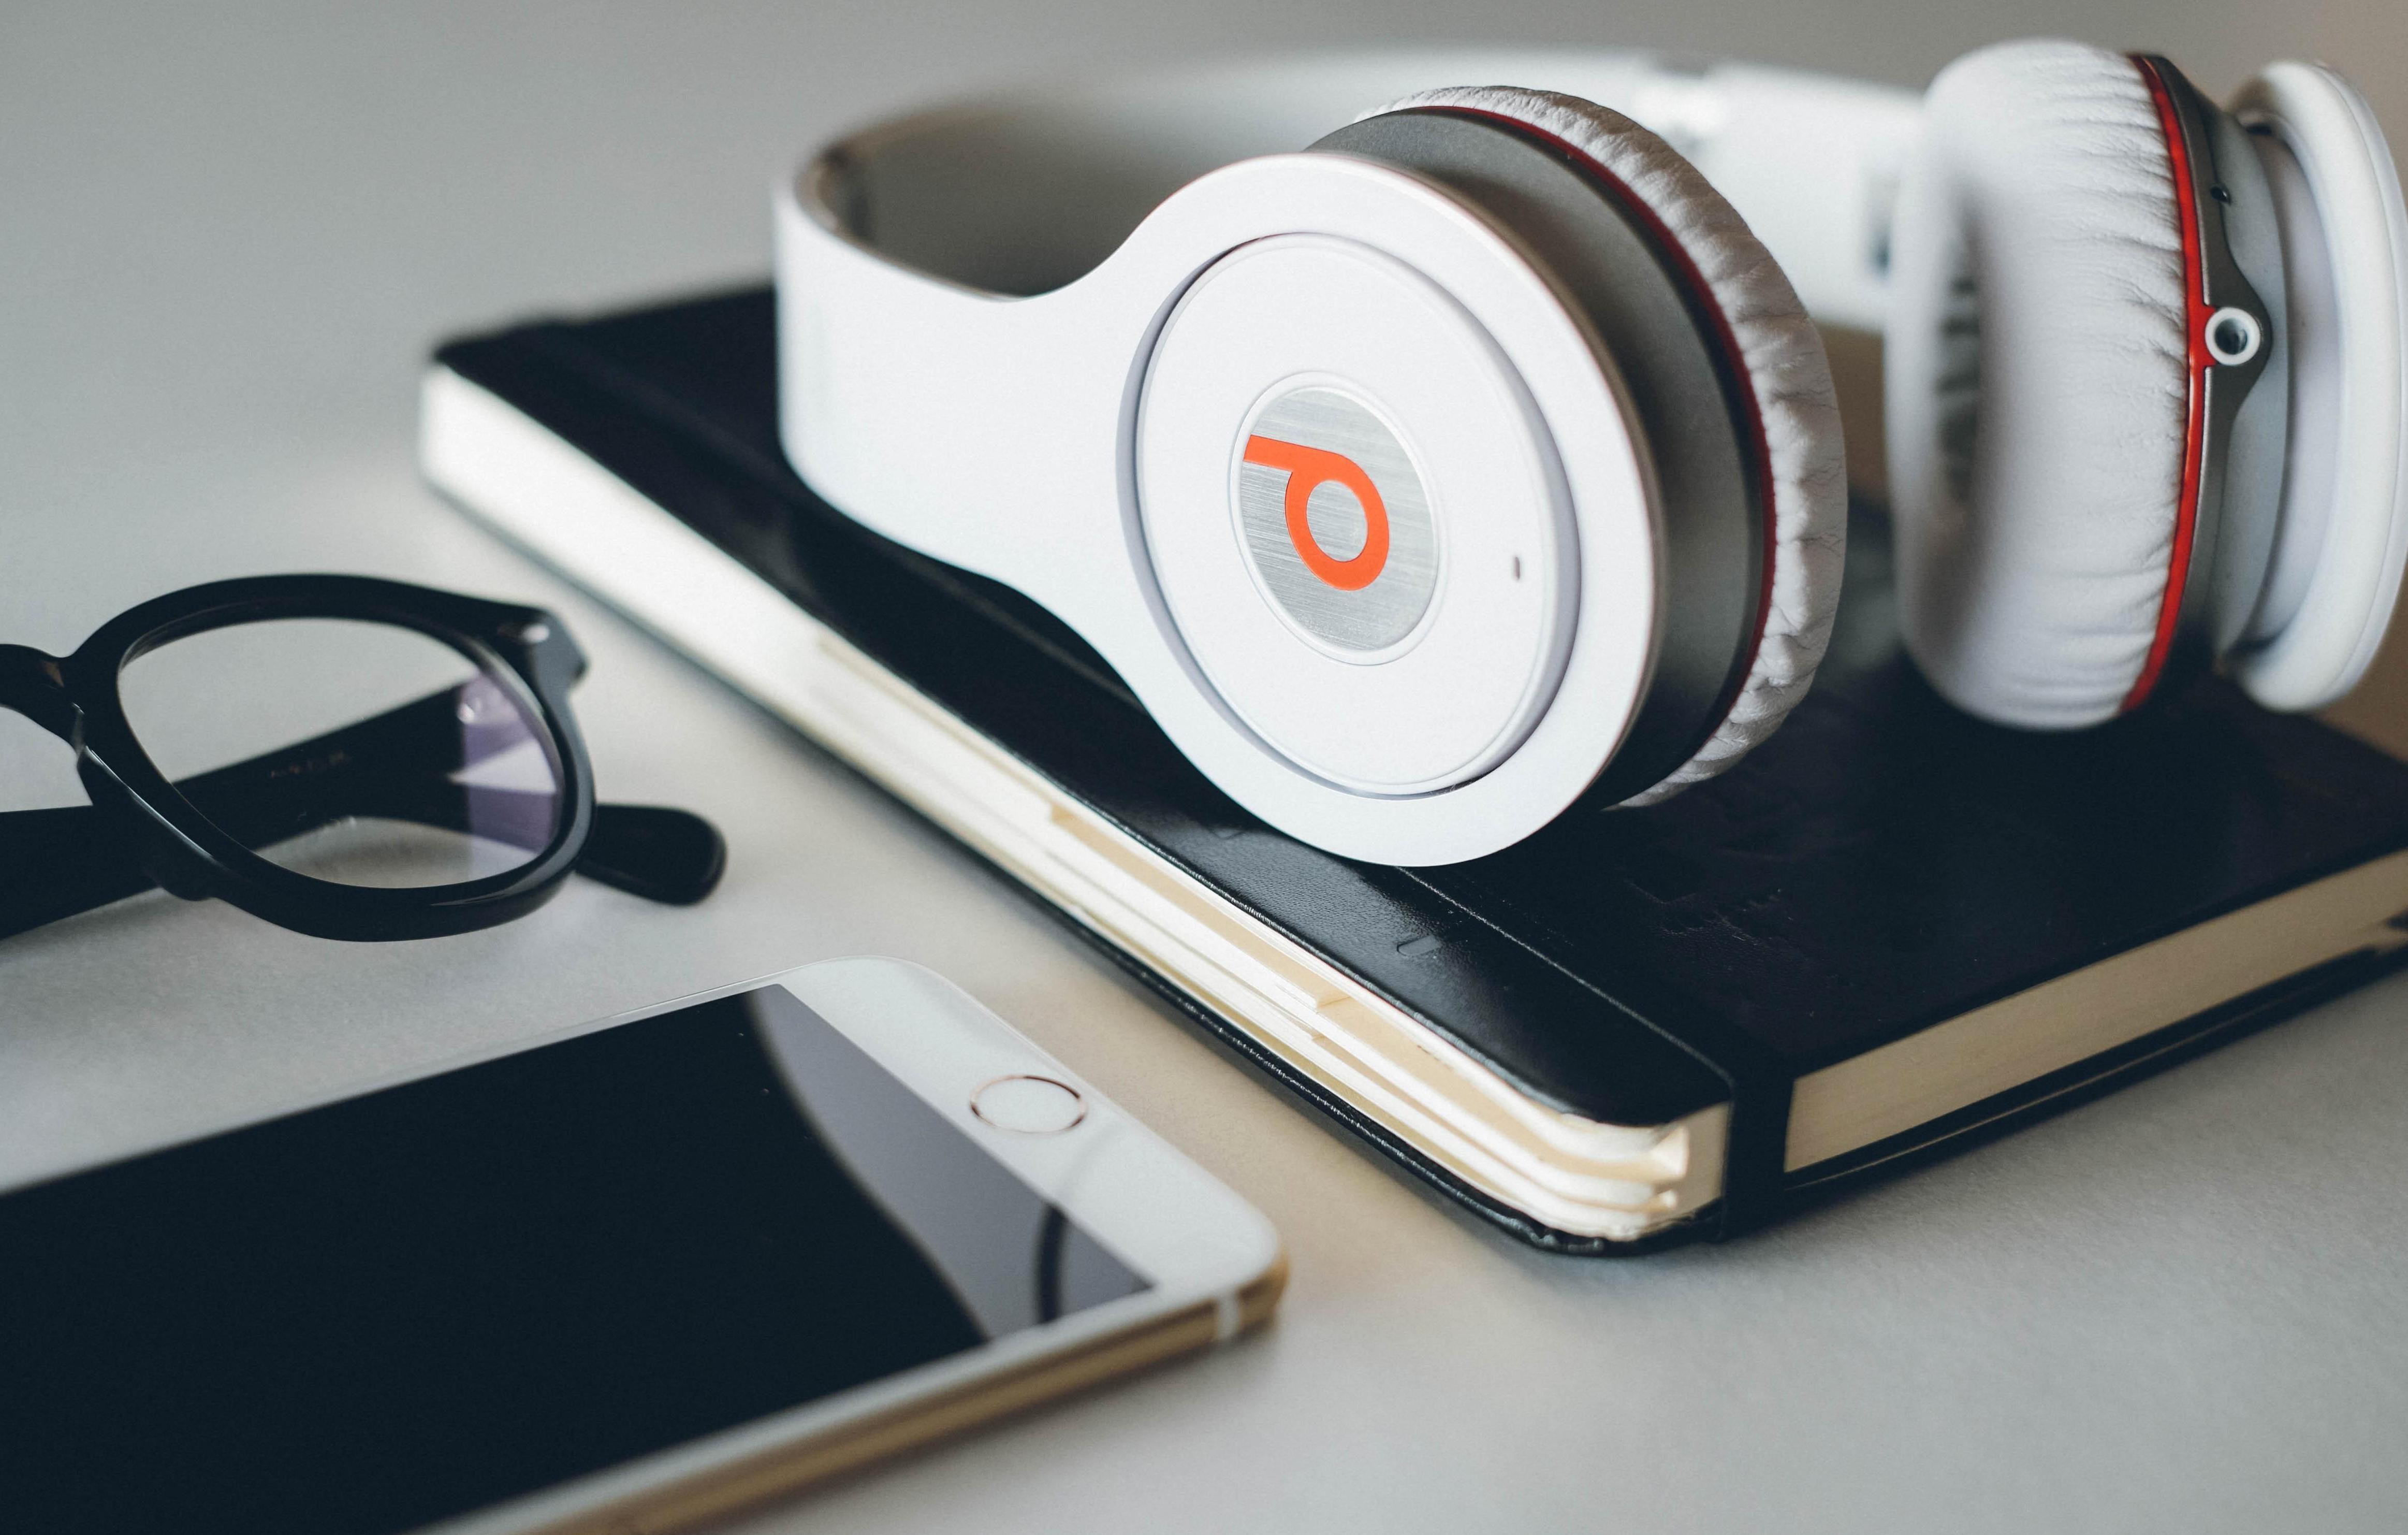 Xmas Offer 2018 Έκπτωση μέχρι 50% και Δωρεάν Συσκευή.